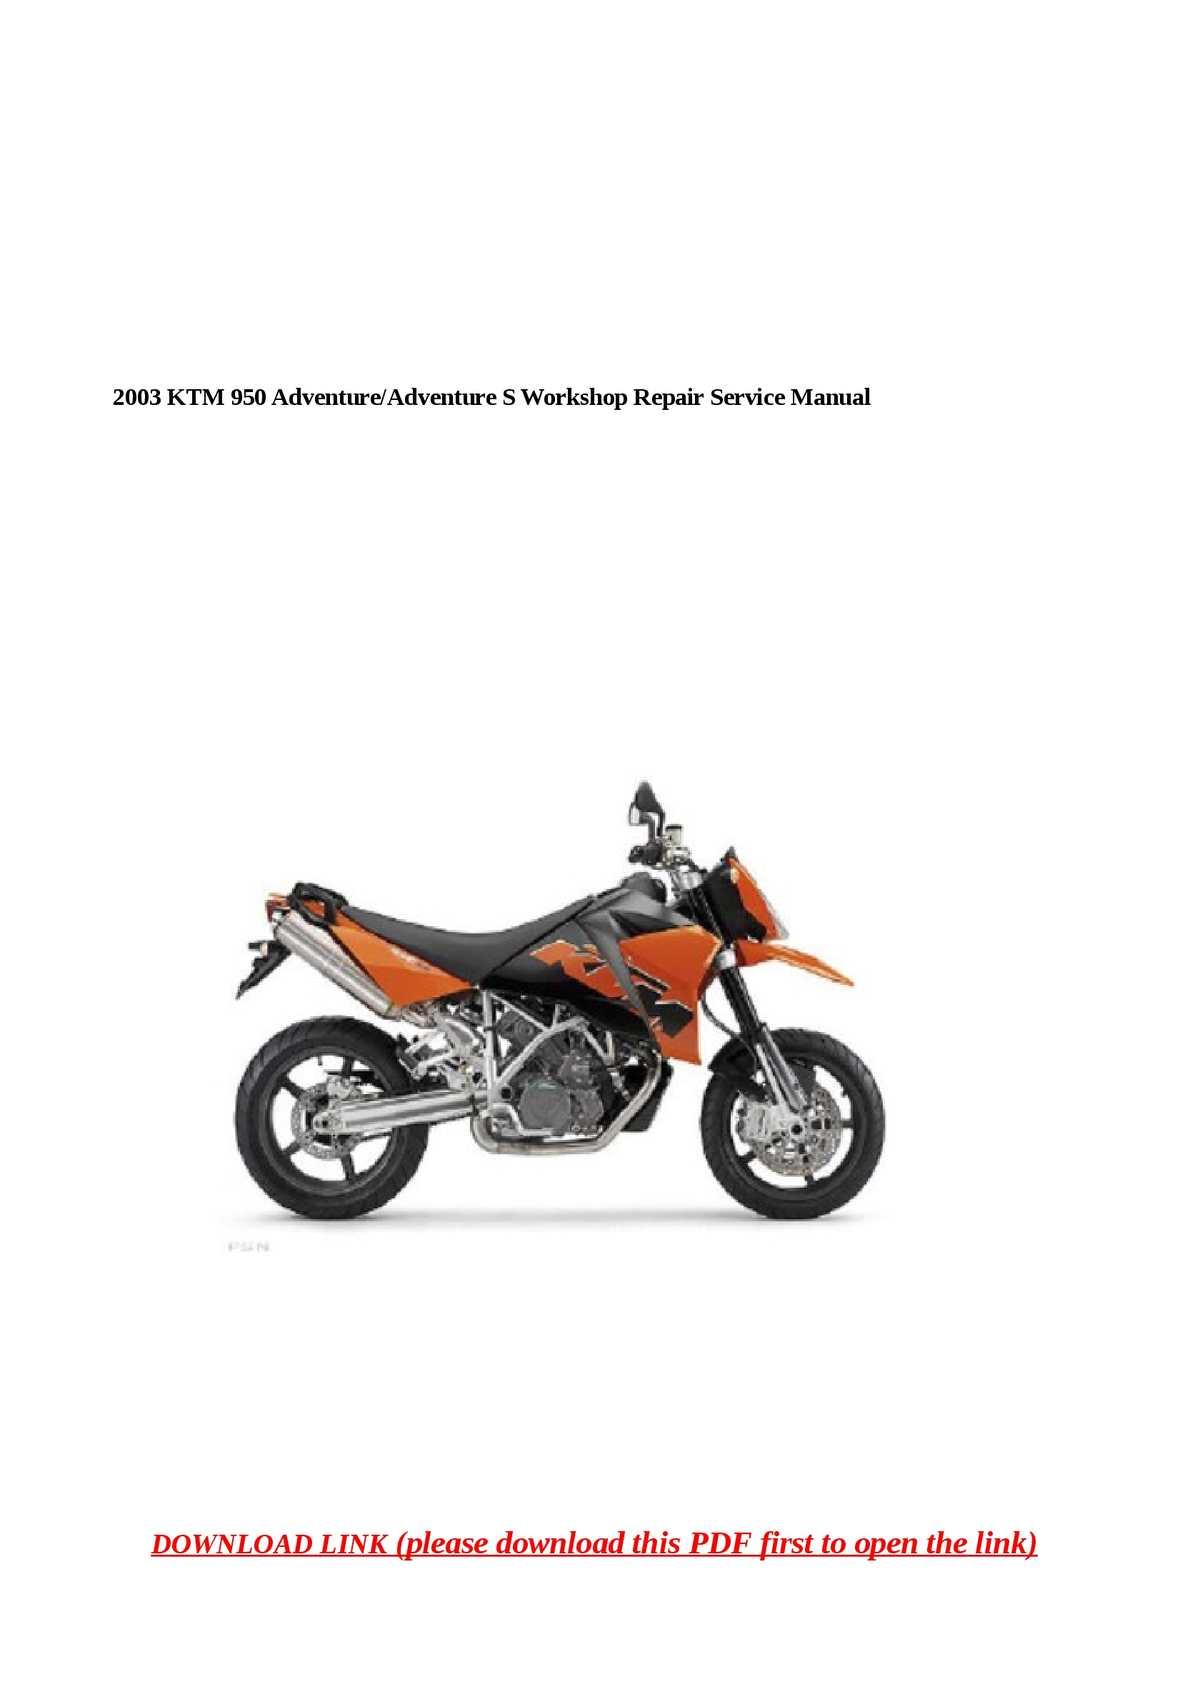 2003 Ktm 950 Adventure Factory Service Repair Manuals